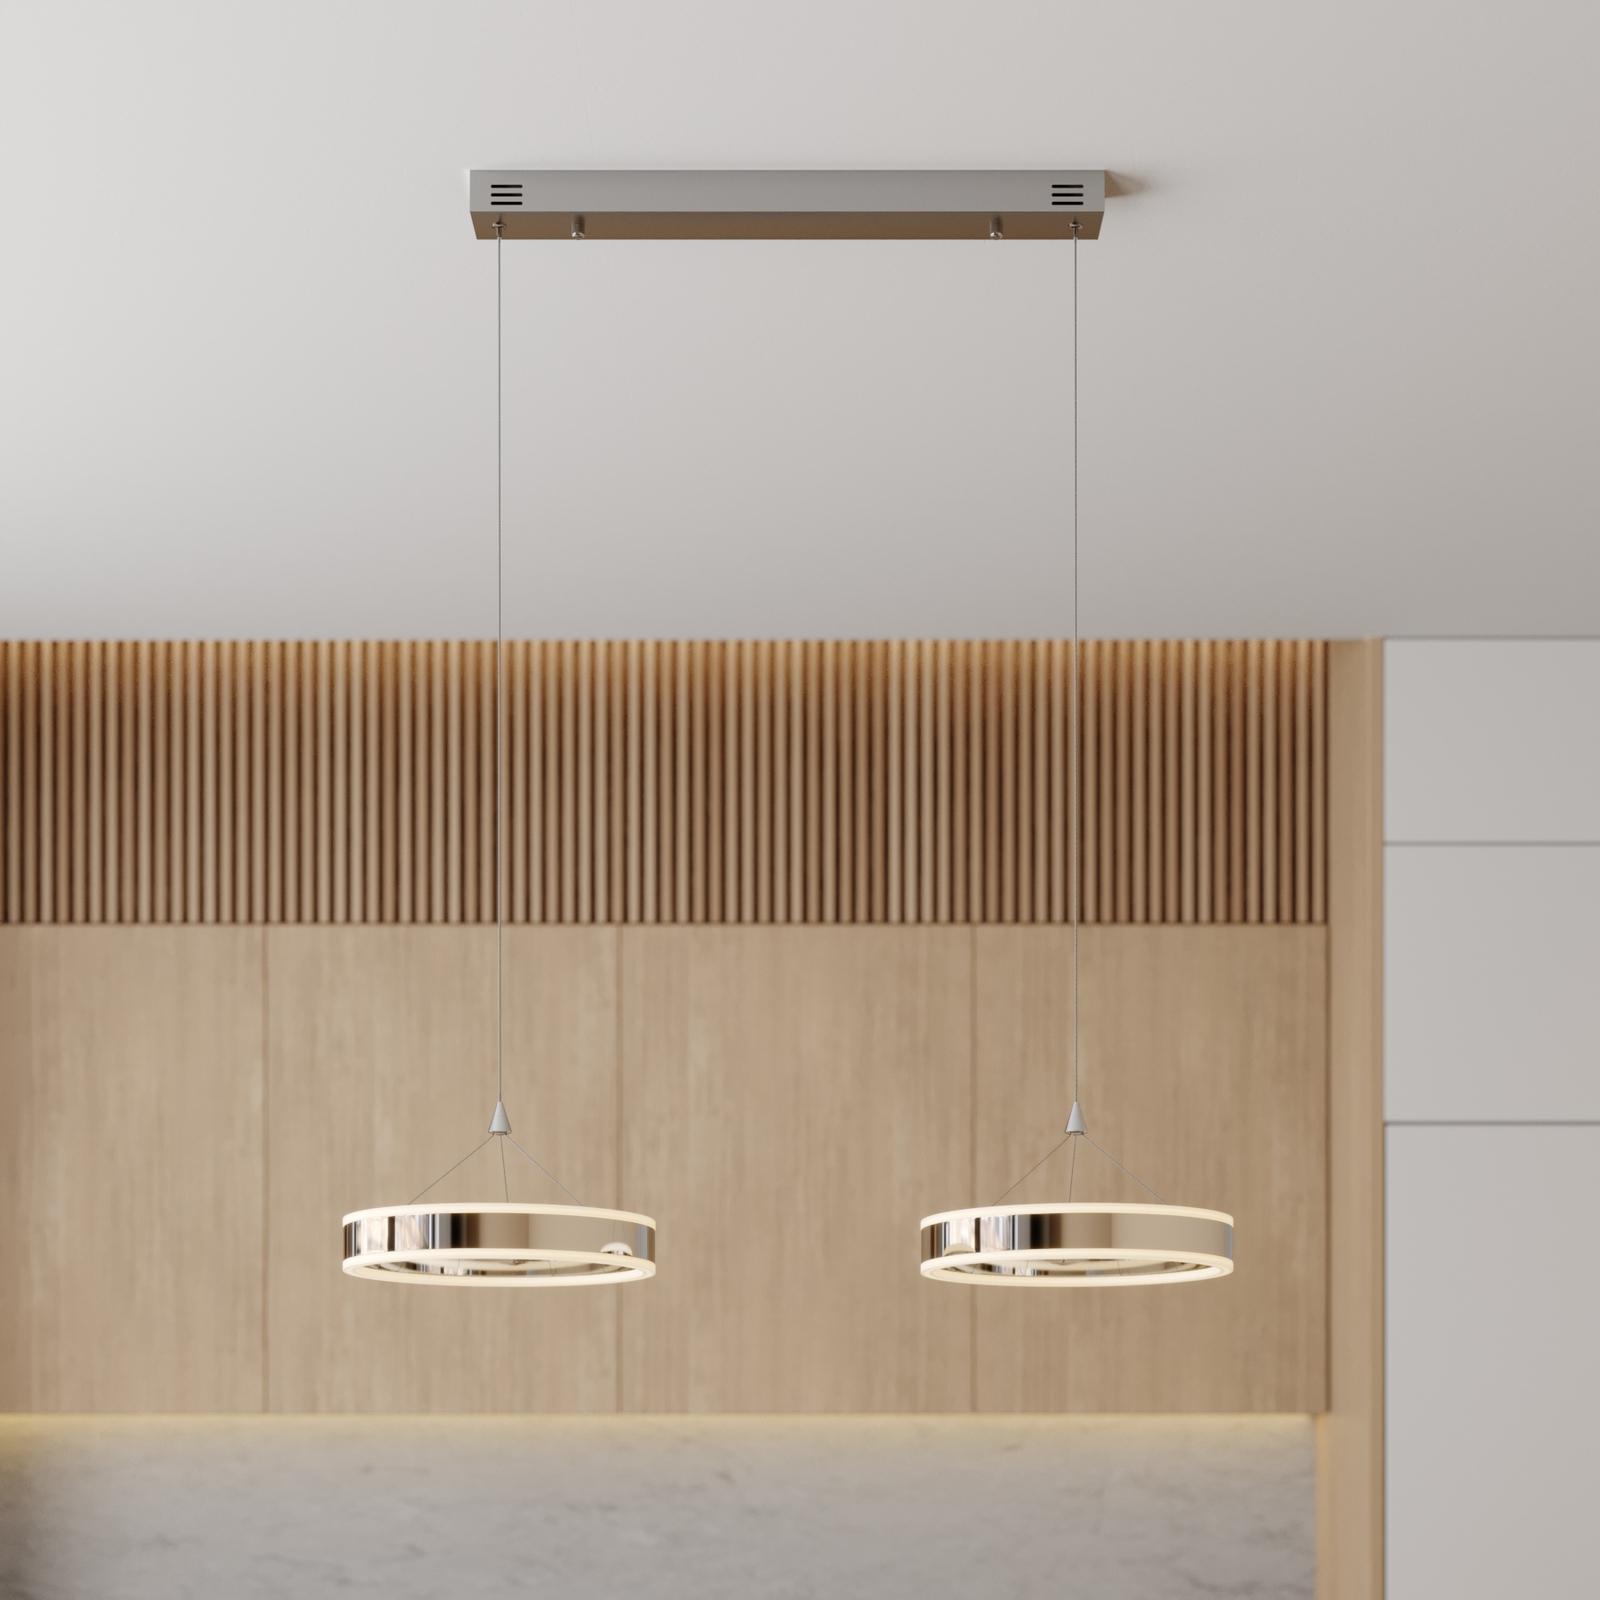 LED hanglamp Lyani, 2 ringen naast elkaar